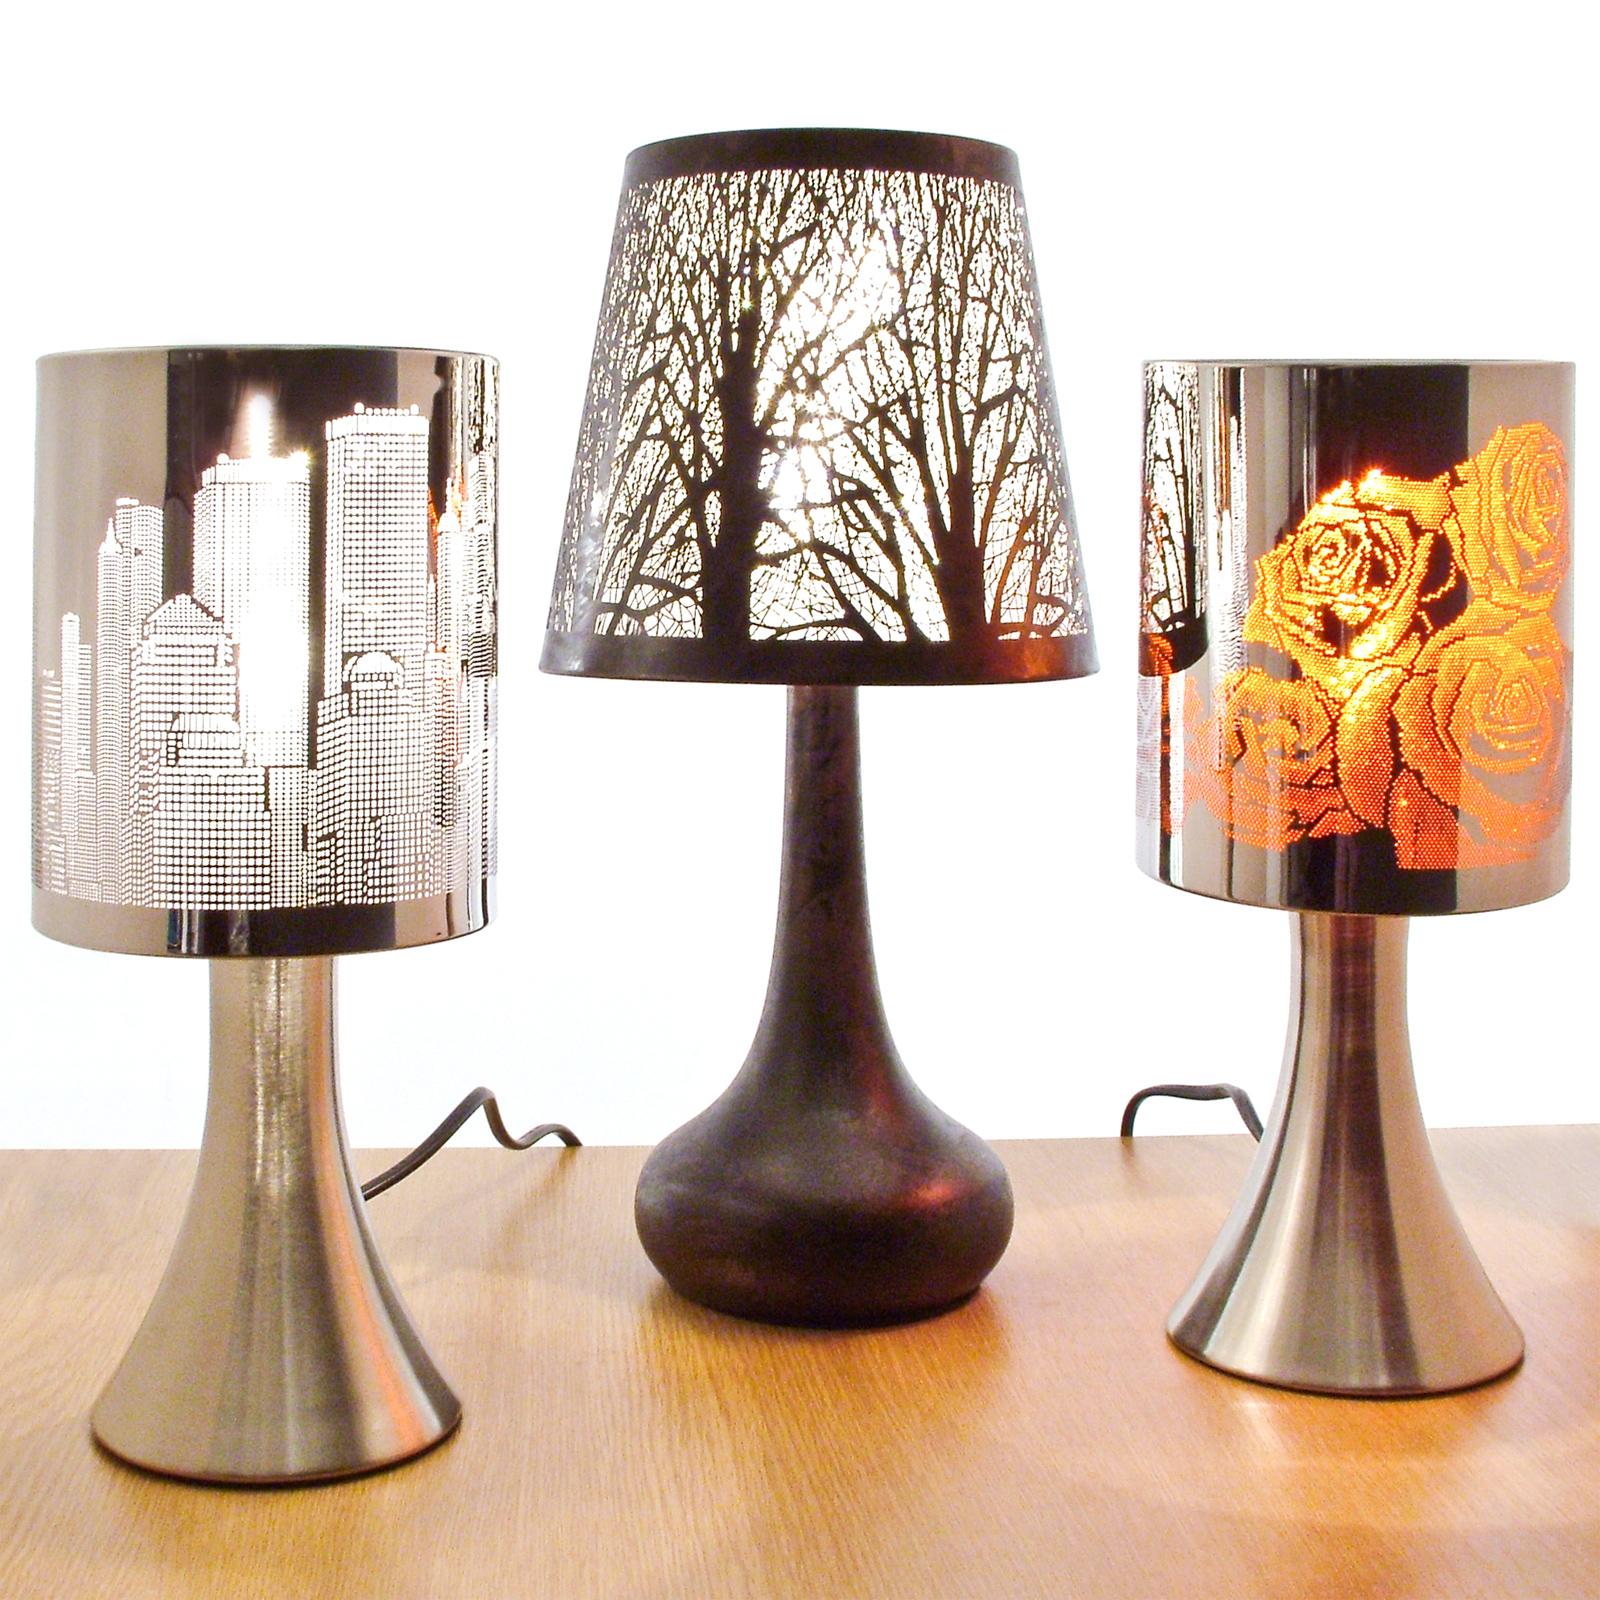 chrome touch lamp dimmer bedside table light new york city